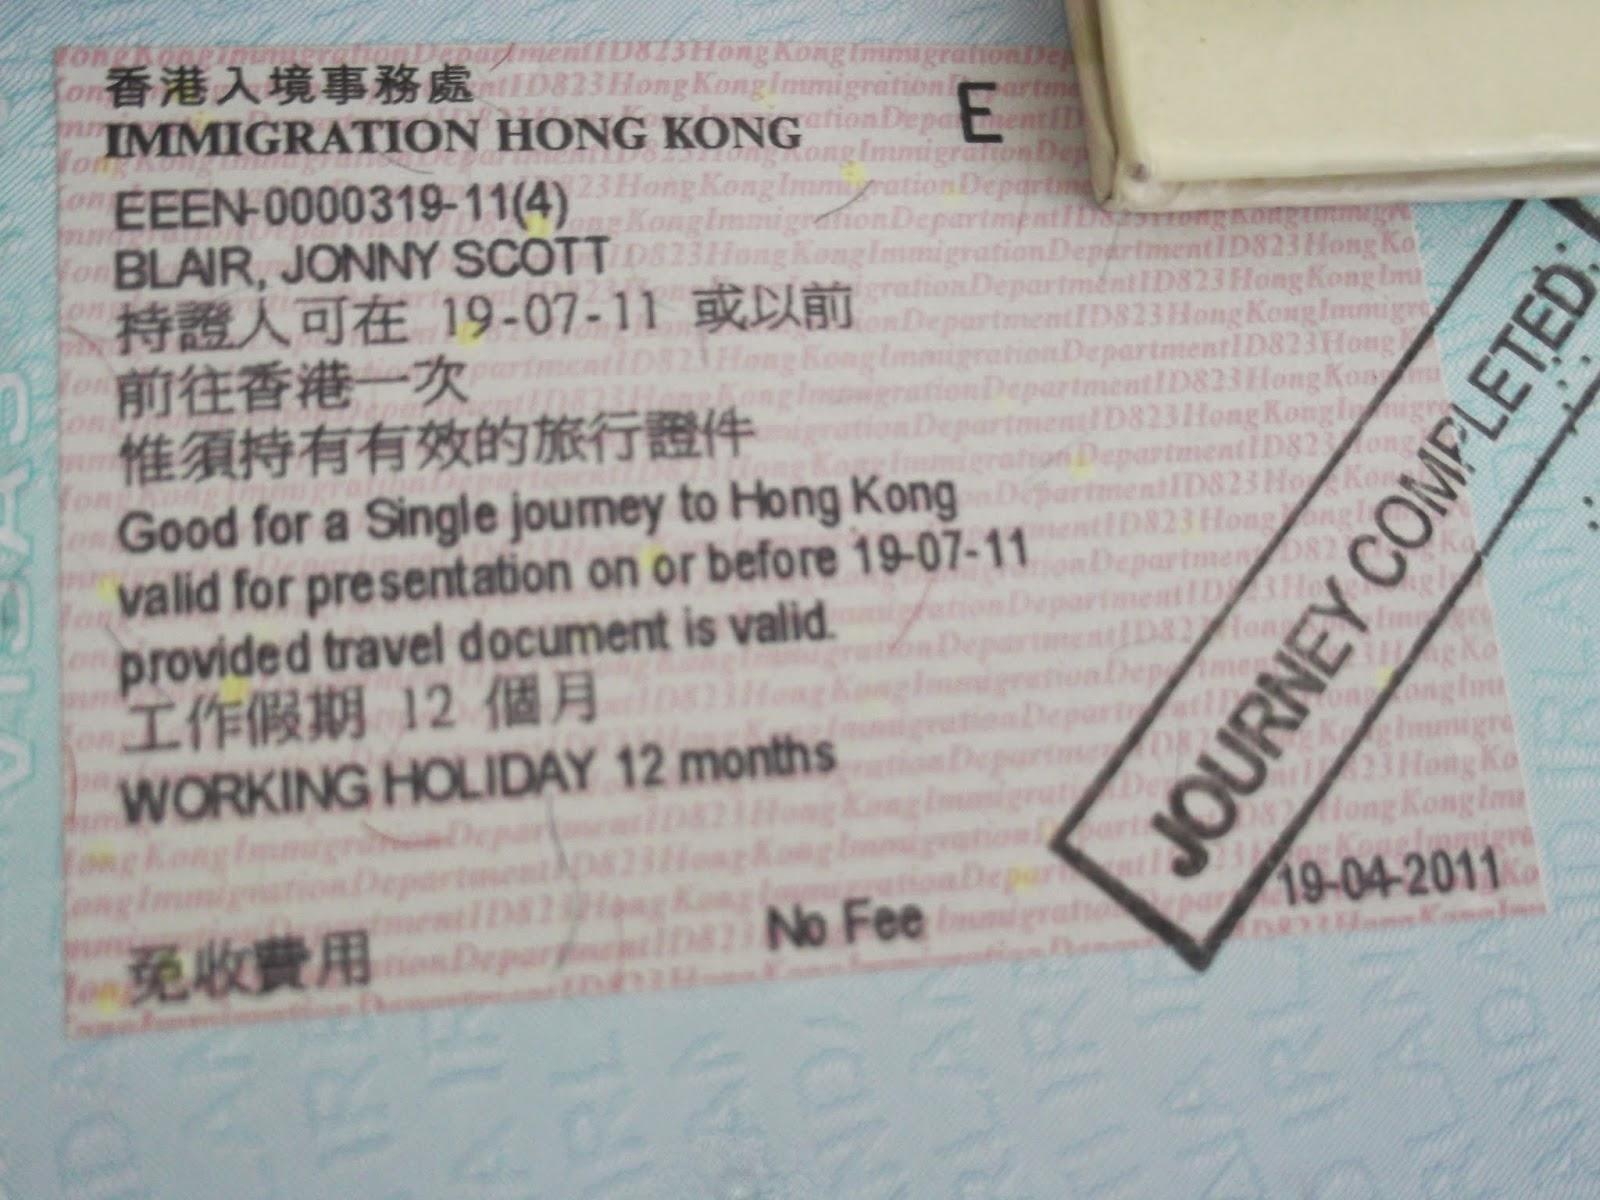 Visa information of hongkong newspedia visa information of hongkong spiritdancerdesigns Choice Image